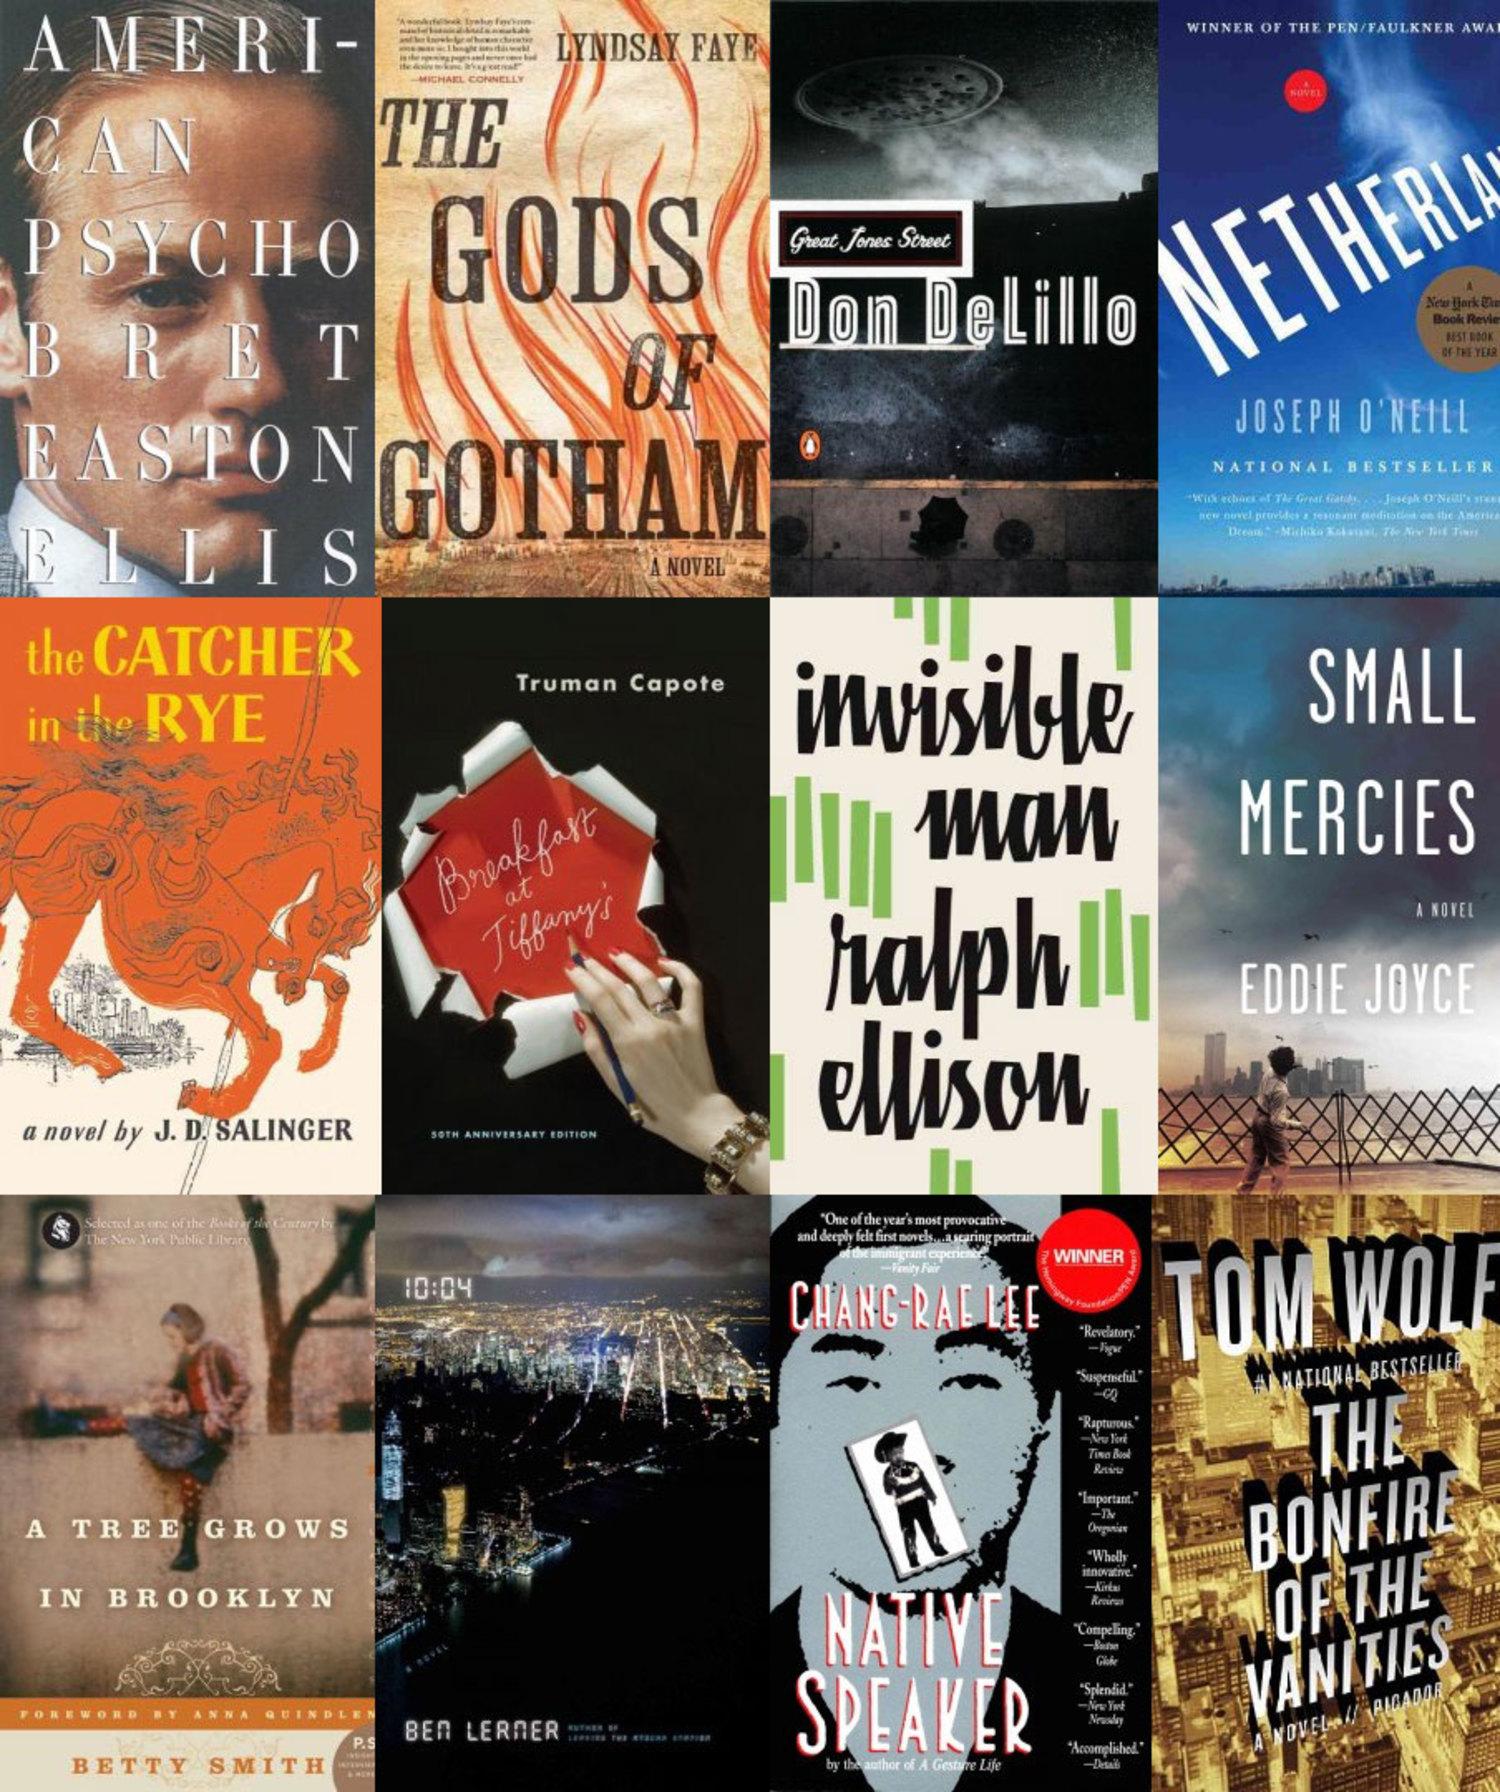 The Best New York City Novels by Neighborhood